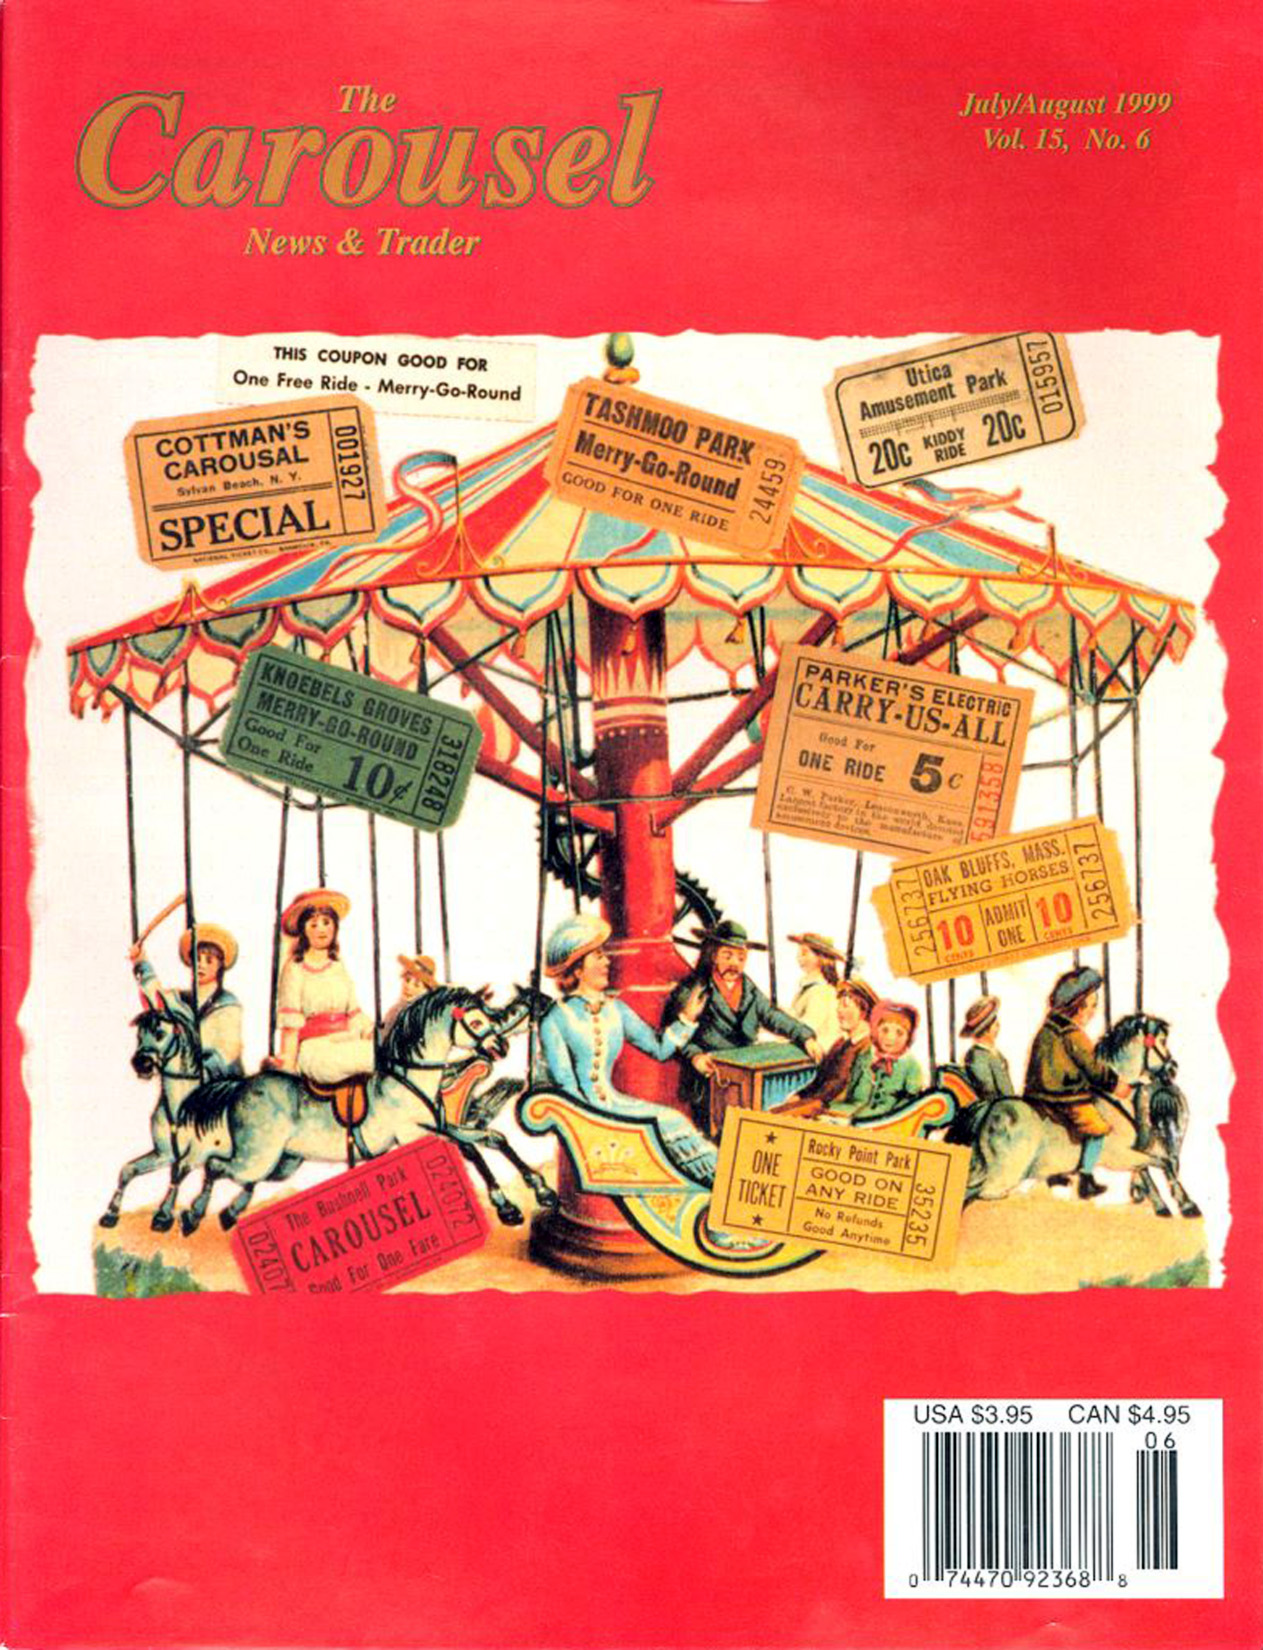 cnt_07-08_1999-Victorian-carousel-lithograph-T-Orlando